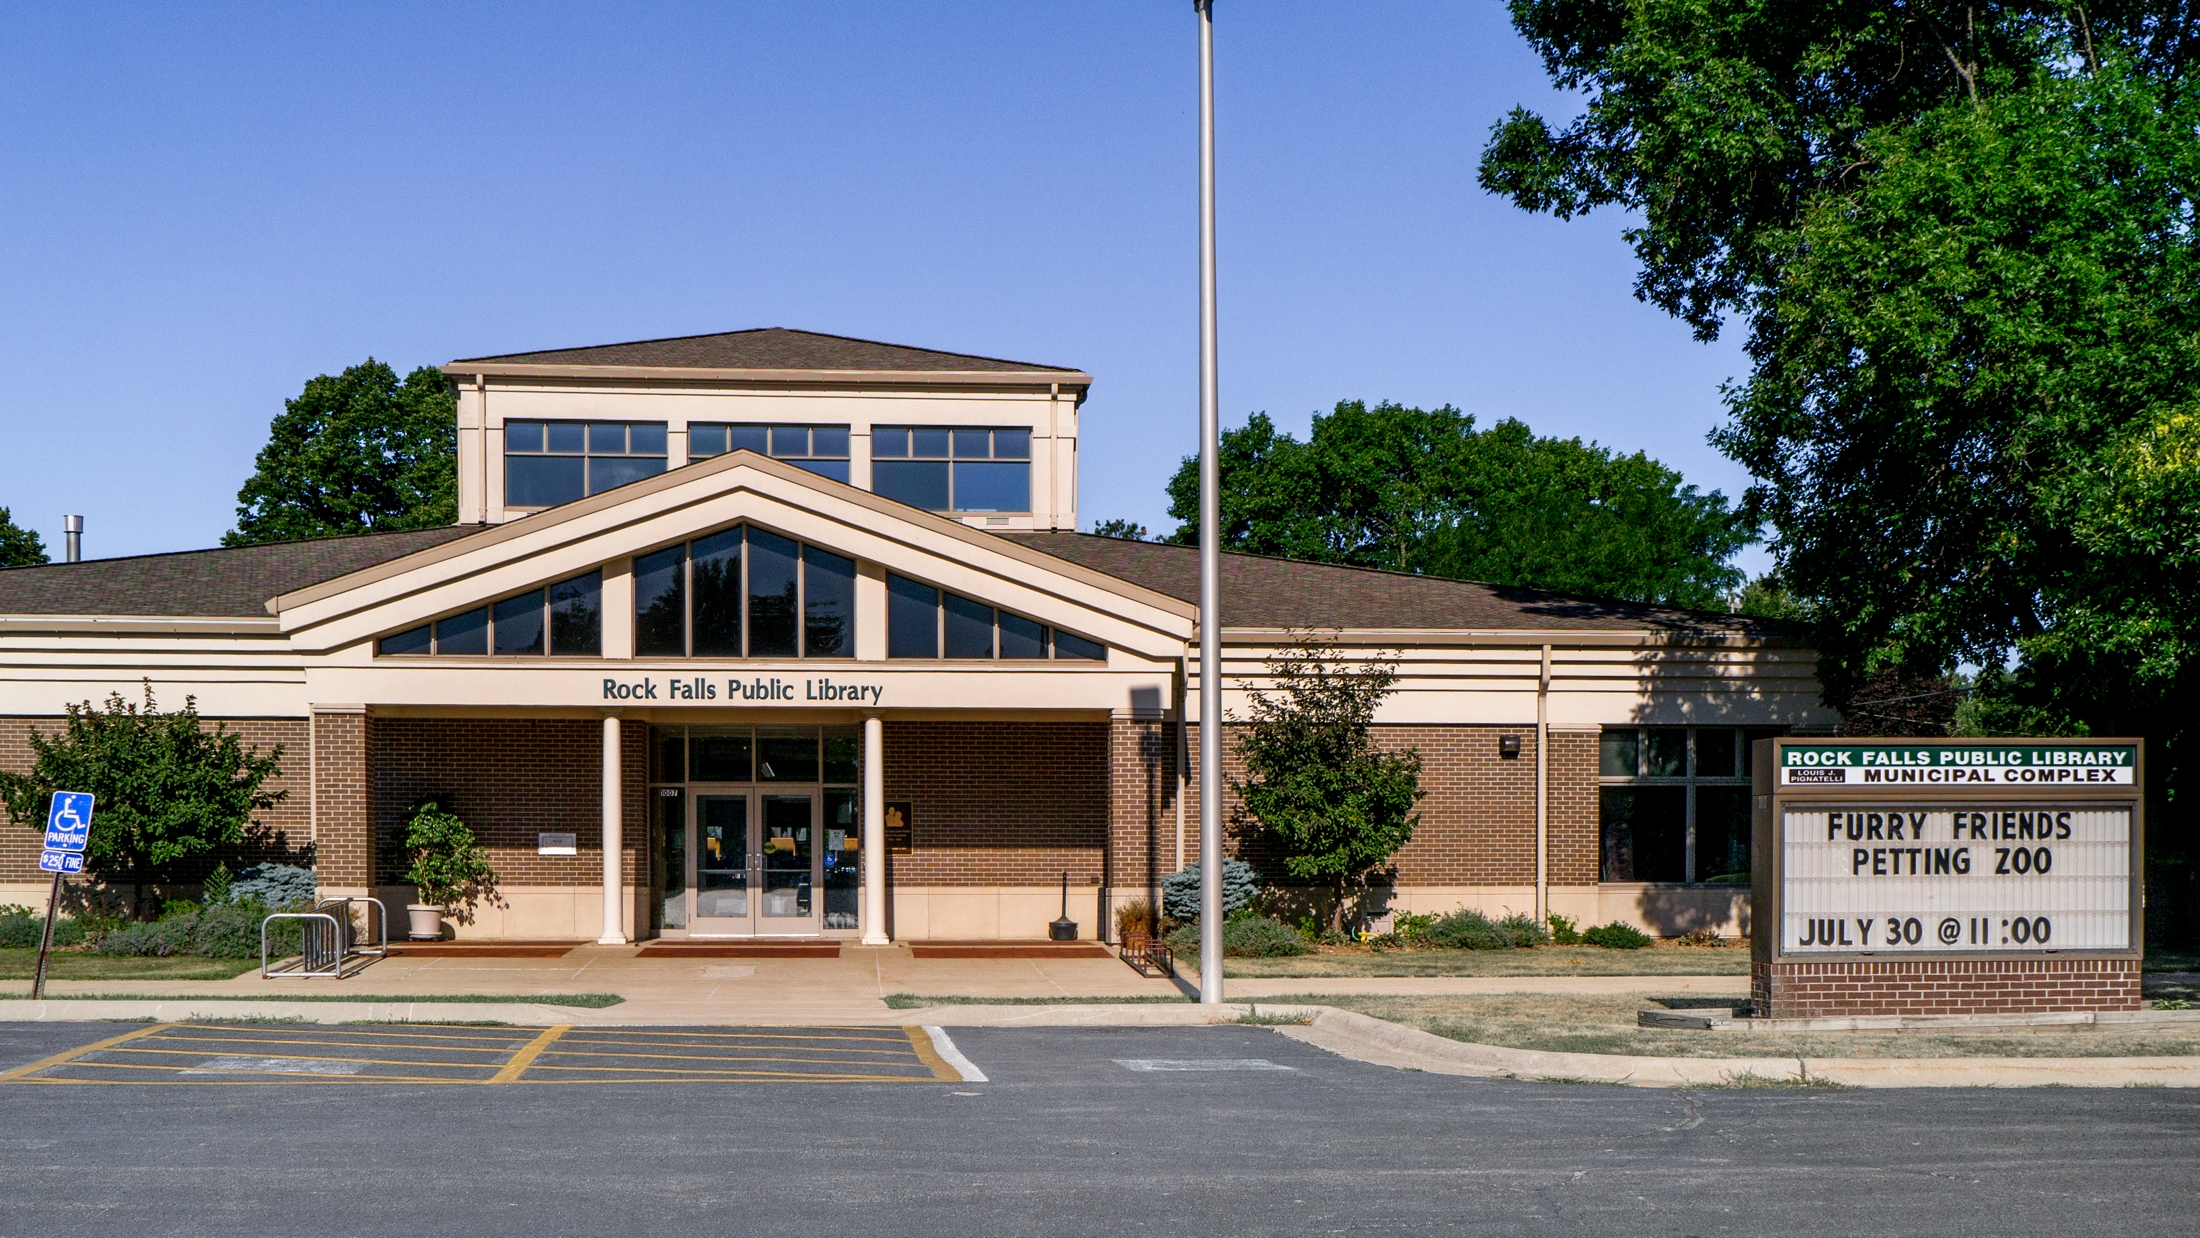 The Rock Falls Public Library - Rock Falls IL